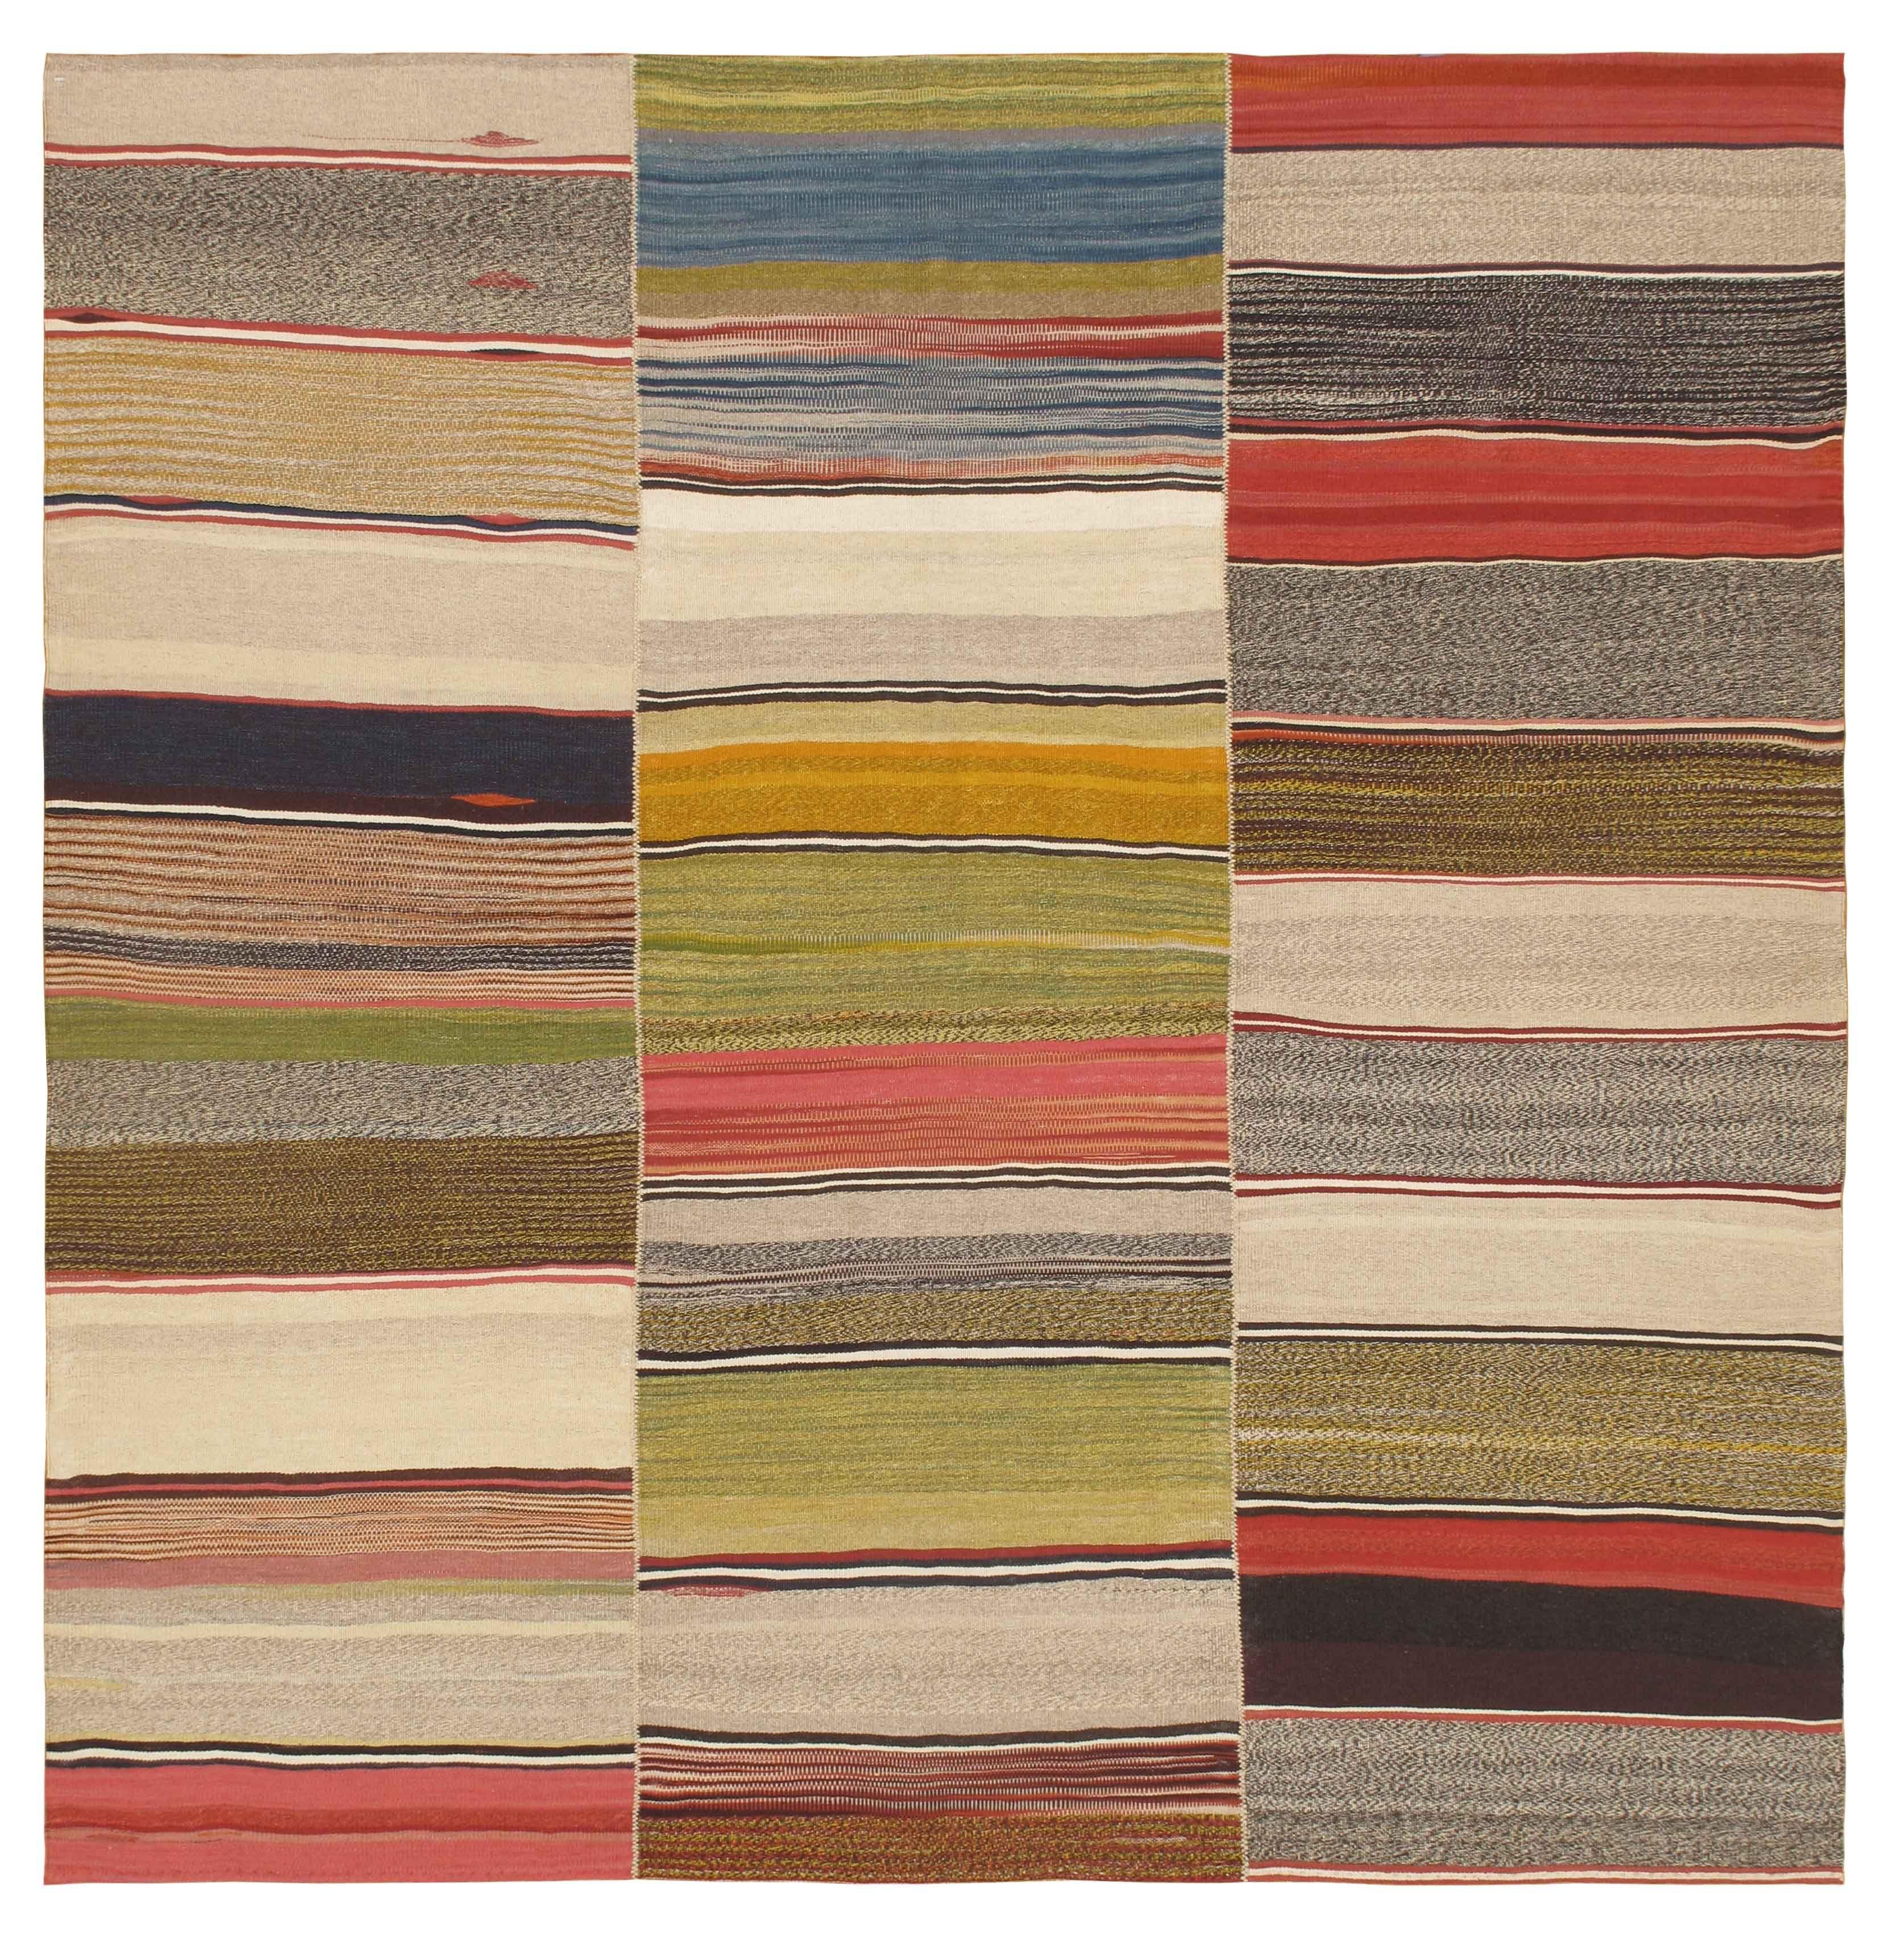 contemporary carpets Google Search art Pinterest Carpets